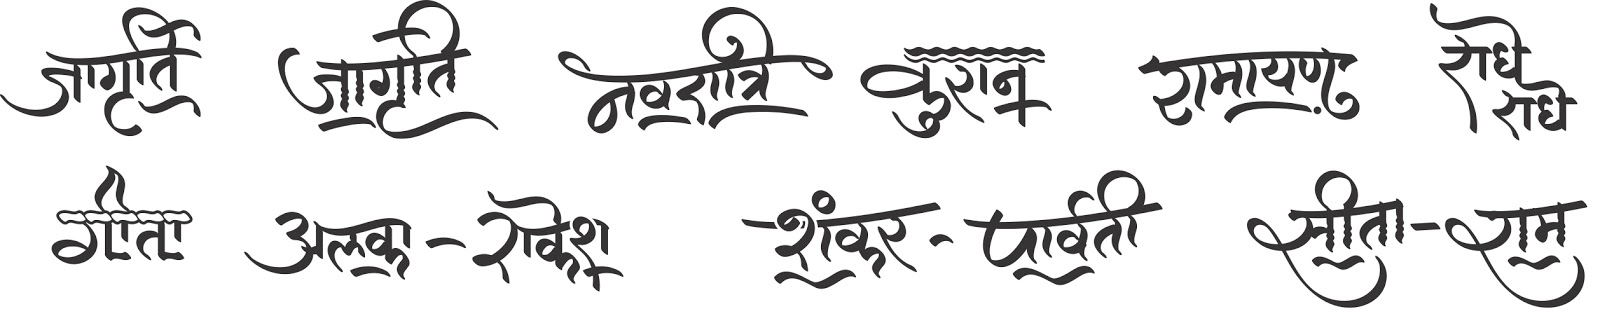 Handbill Poster Text Calligraphy Ready Made